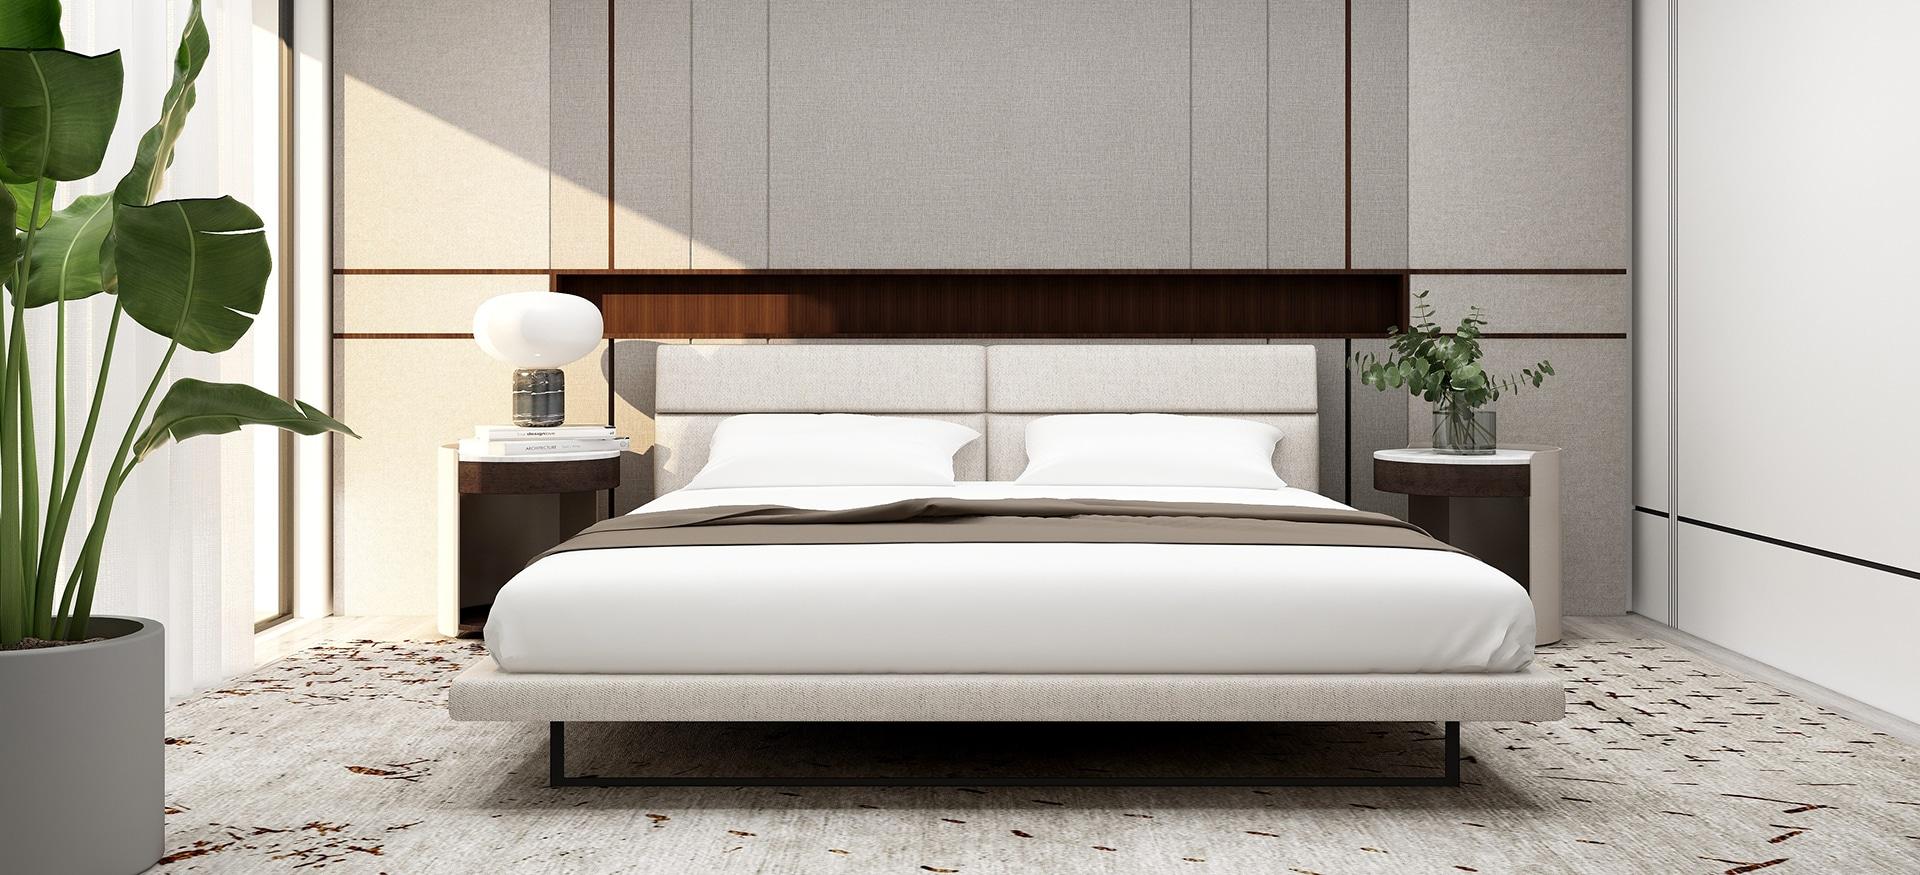 Amor Bed